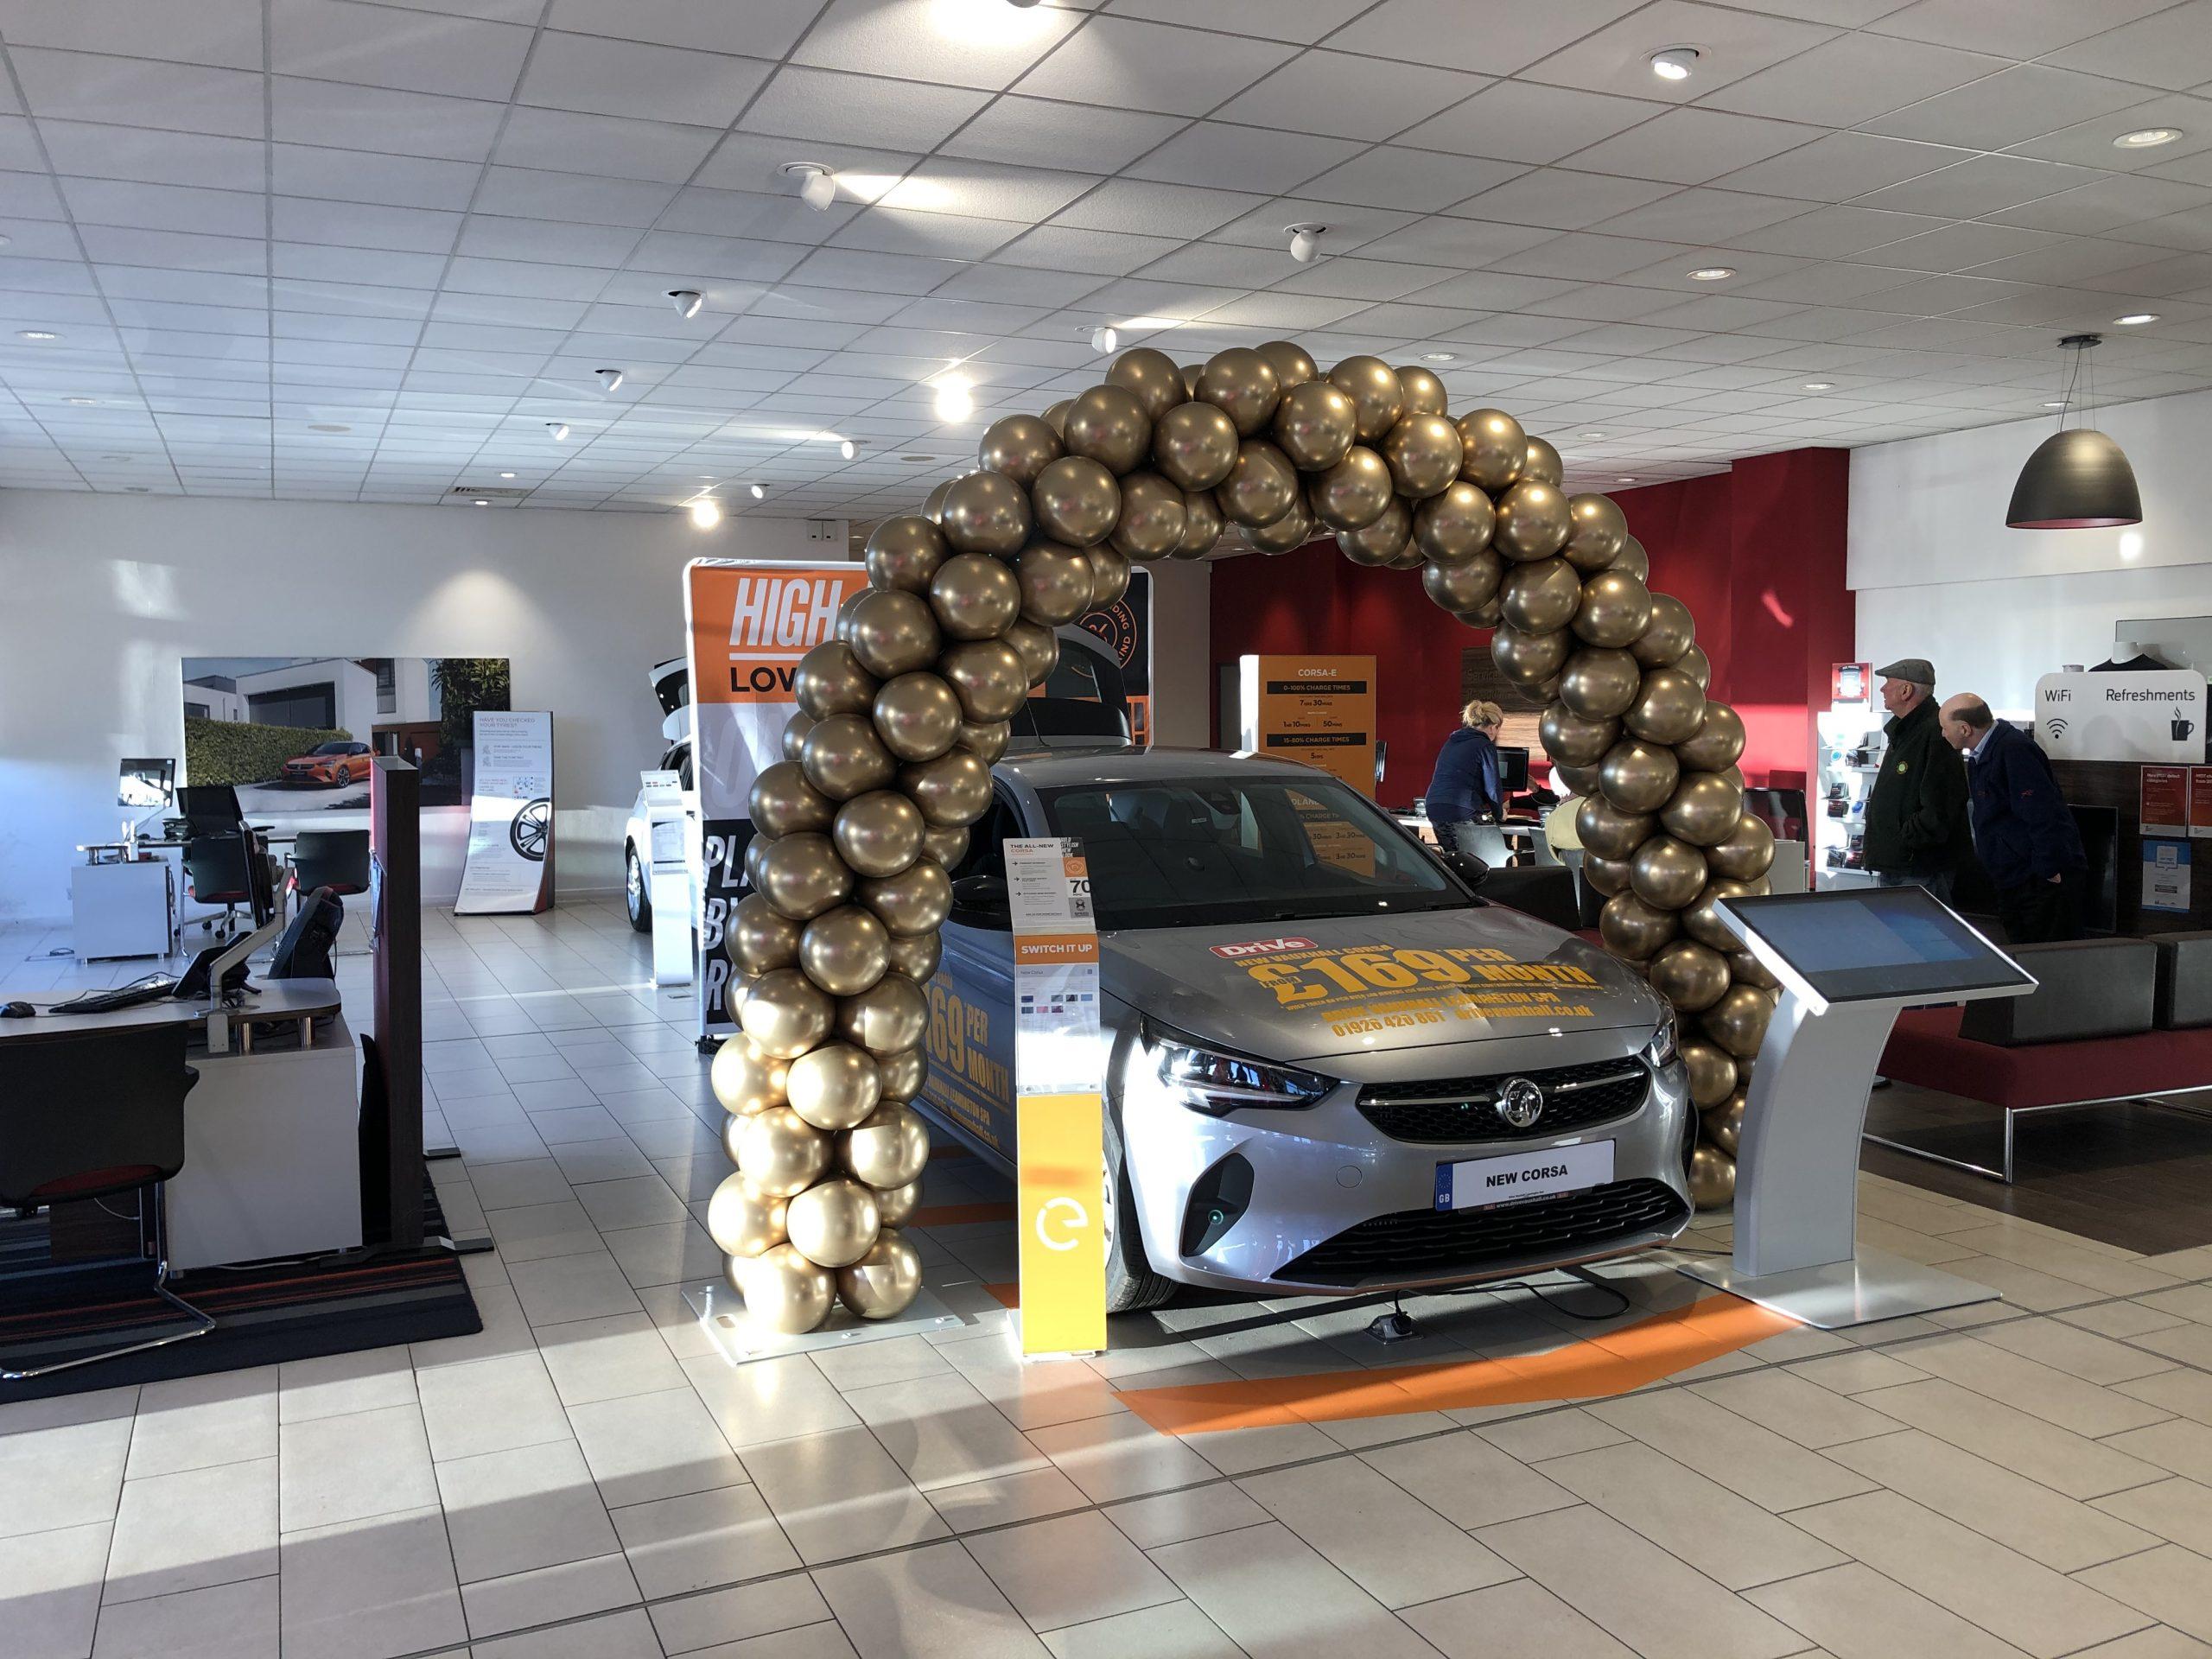 Golden spiral arch over new car.